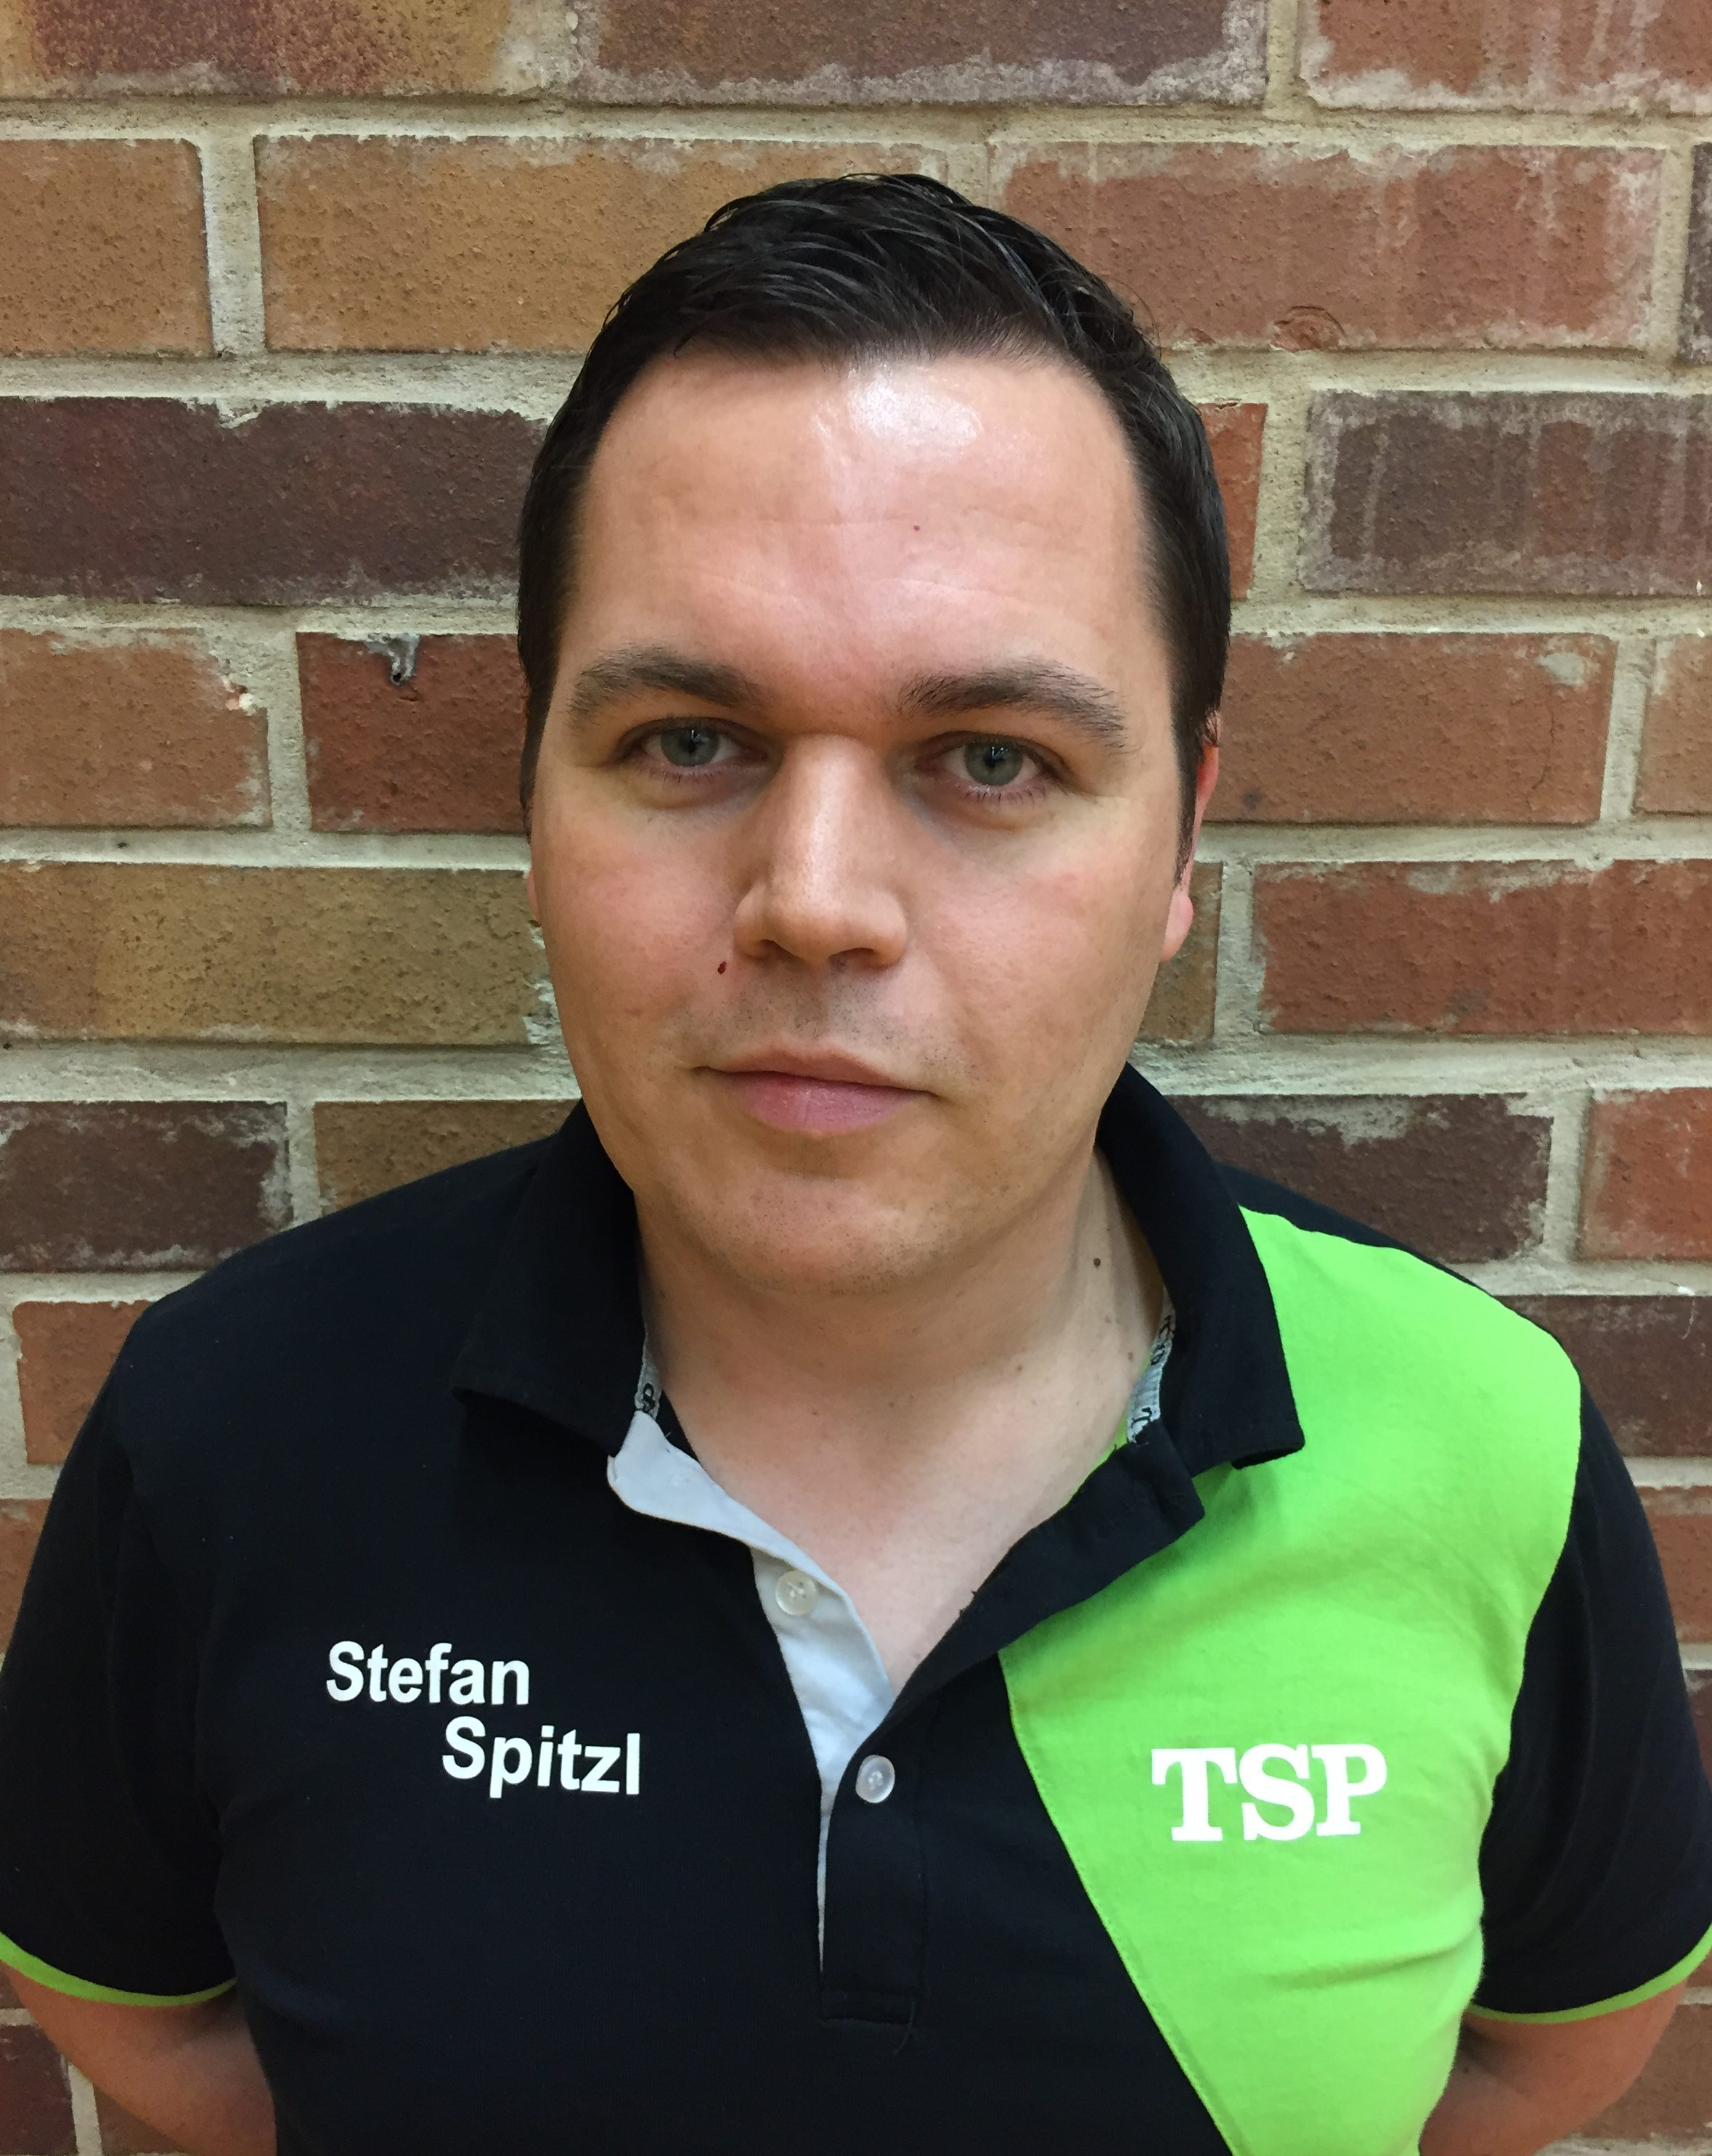 Stefan Spitzl